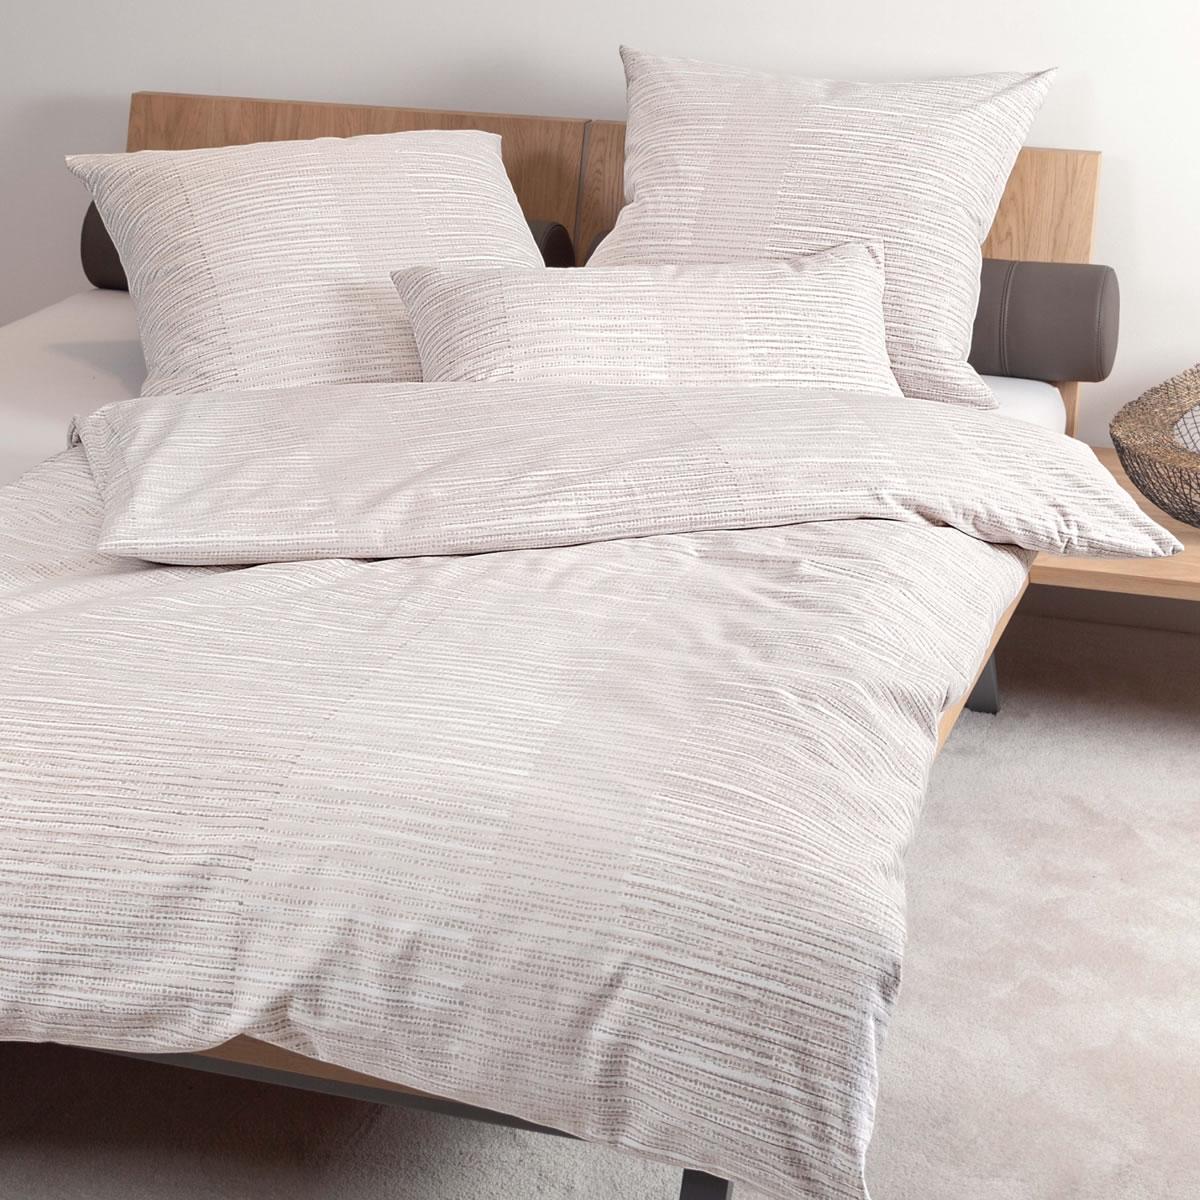 janine edel flanell bettw sche chinchilla s design 76010 07 taupe sand beige ebay. Black Bedroom Furniture Sets. Home Design Ideas